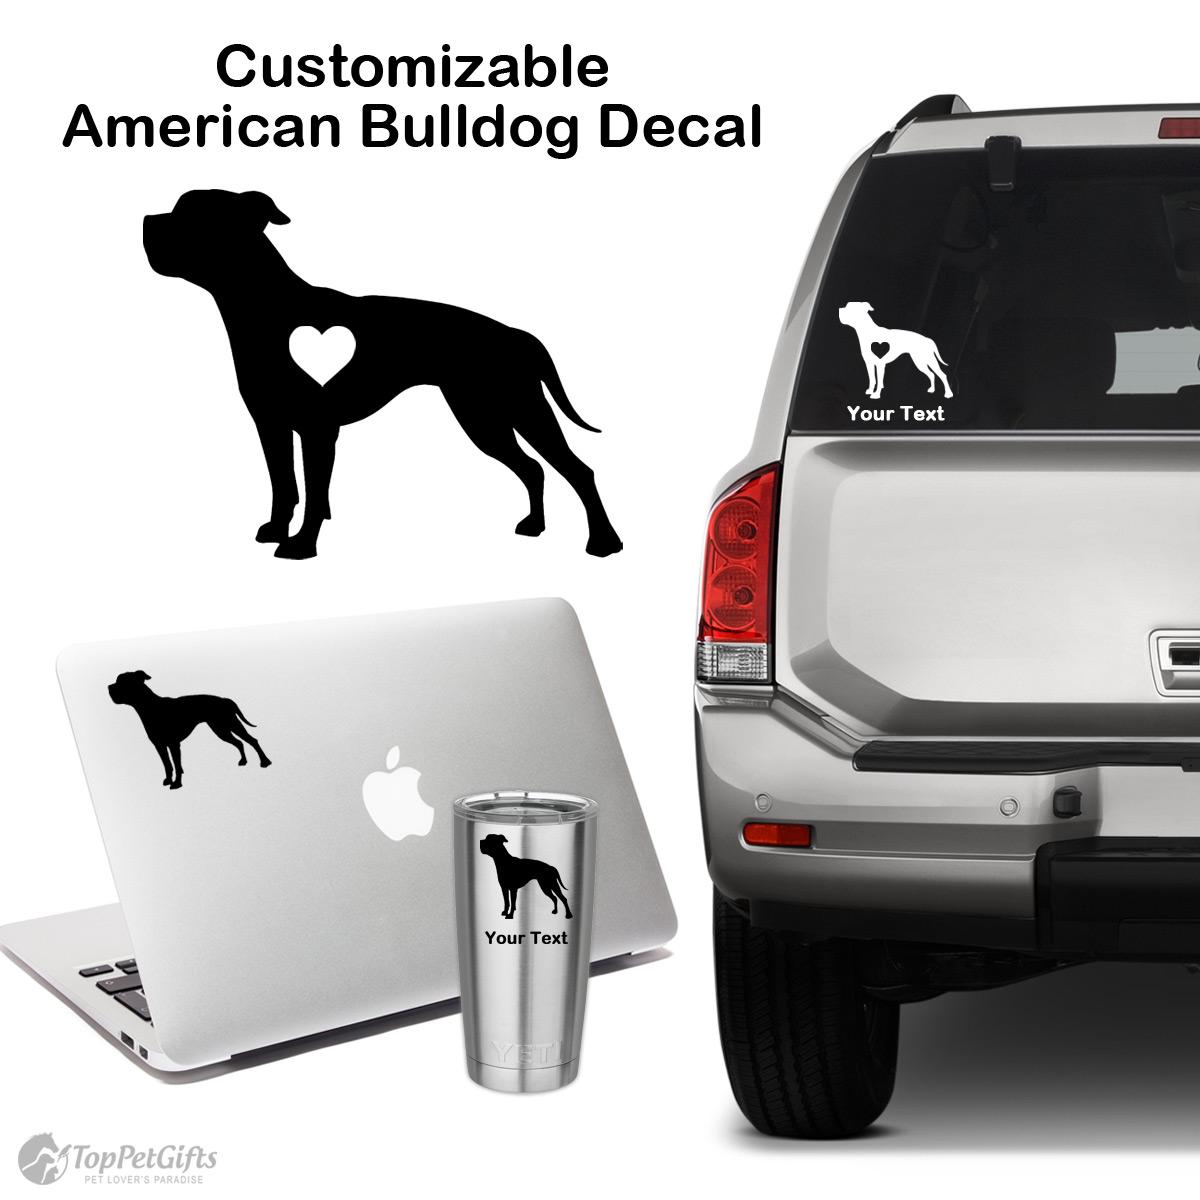 Personalized American Bulldog Decal